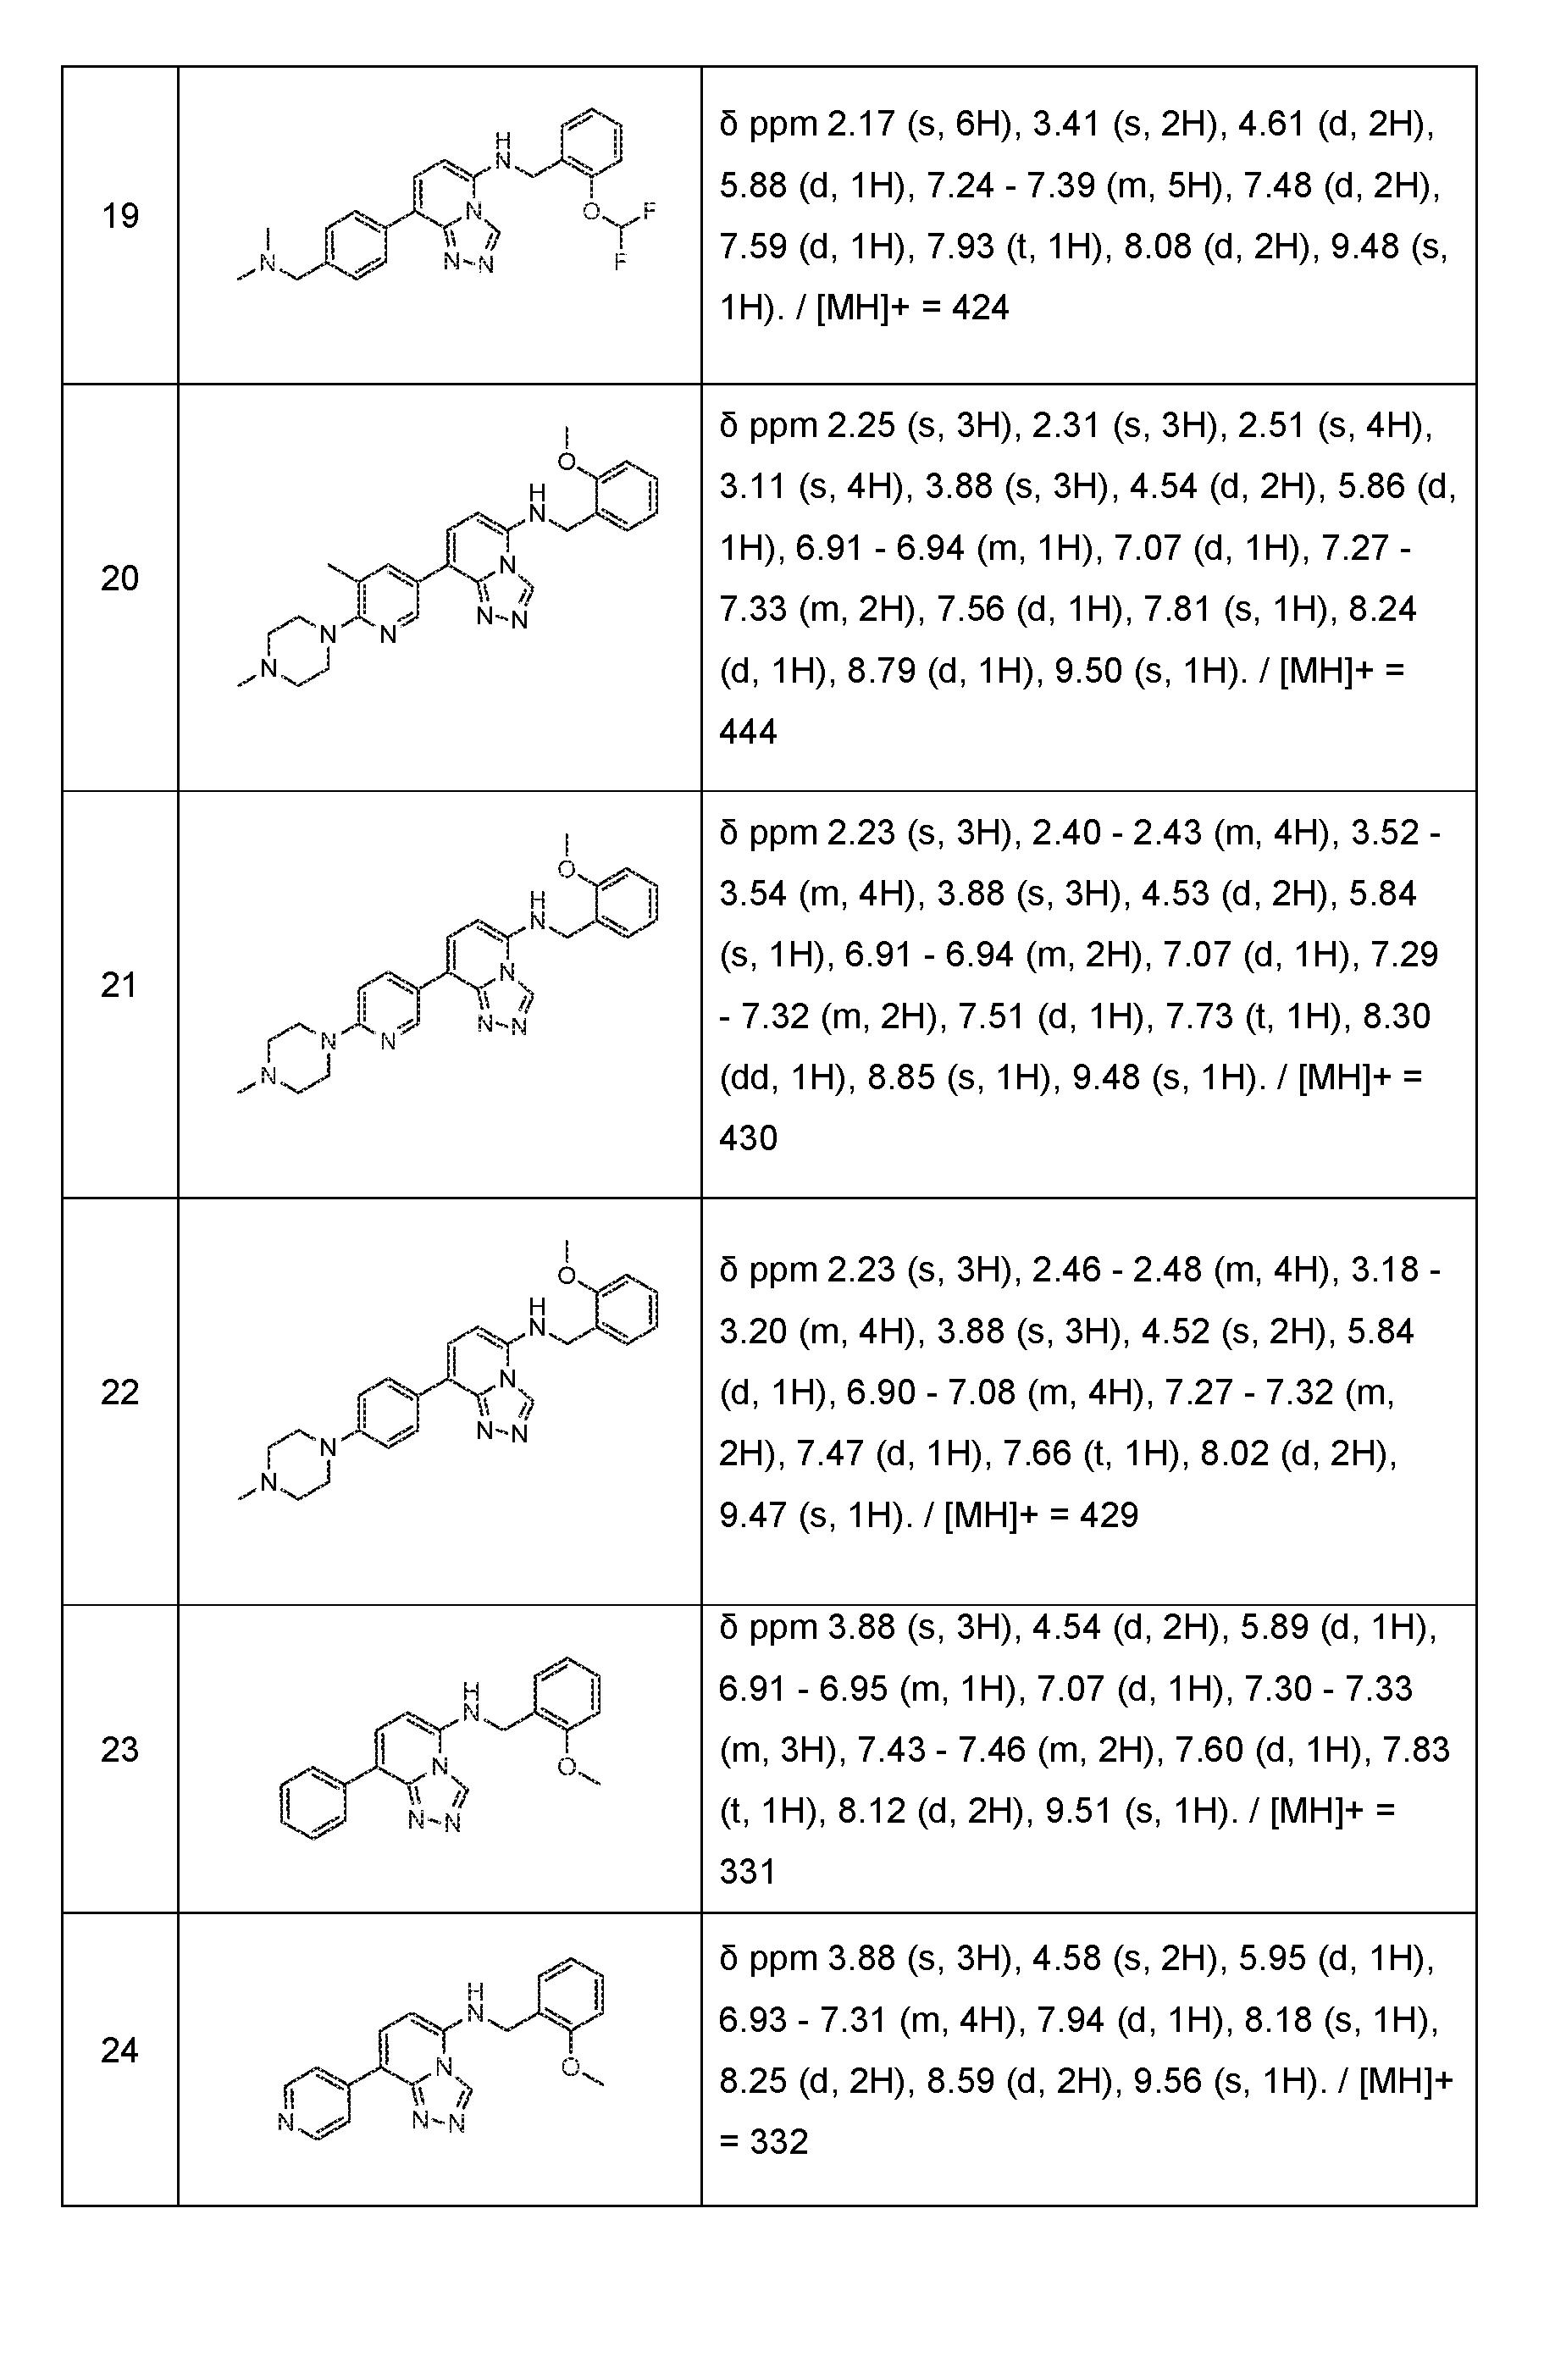 Waschtischarmaturen Dianhydro Ff 90°-7/8 Ff 90°